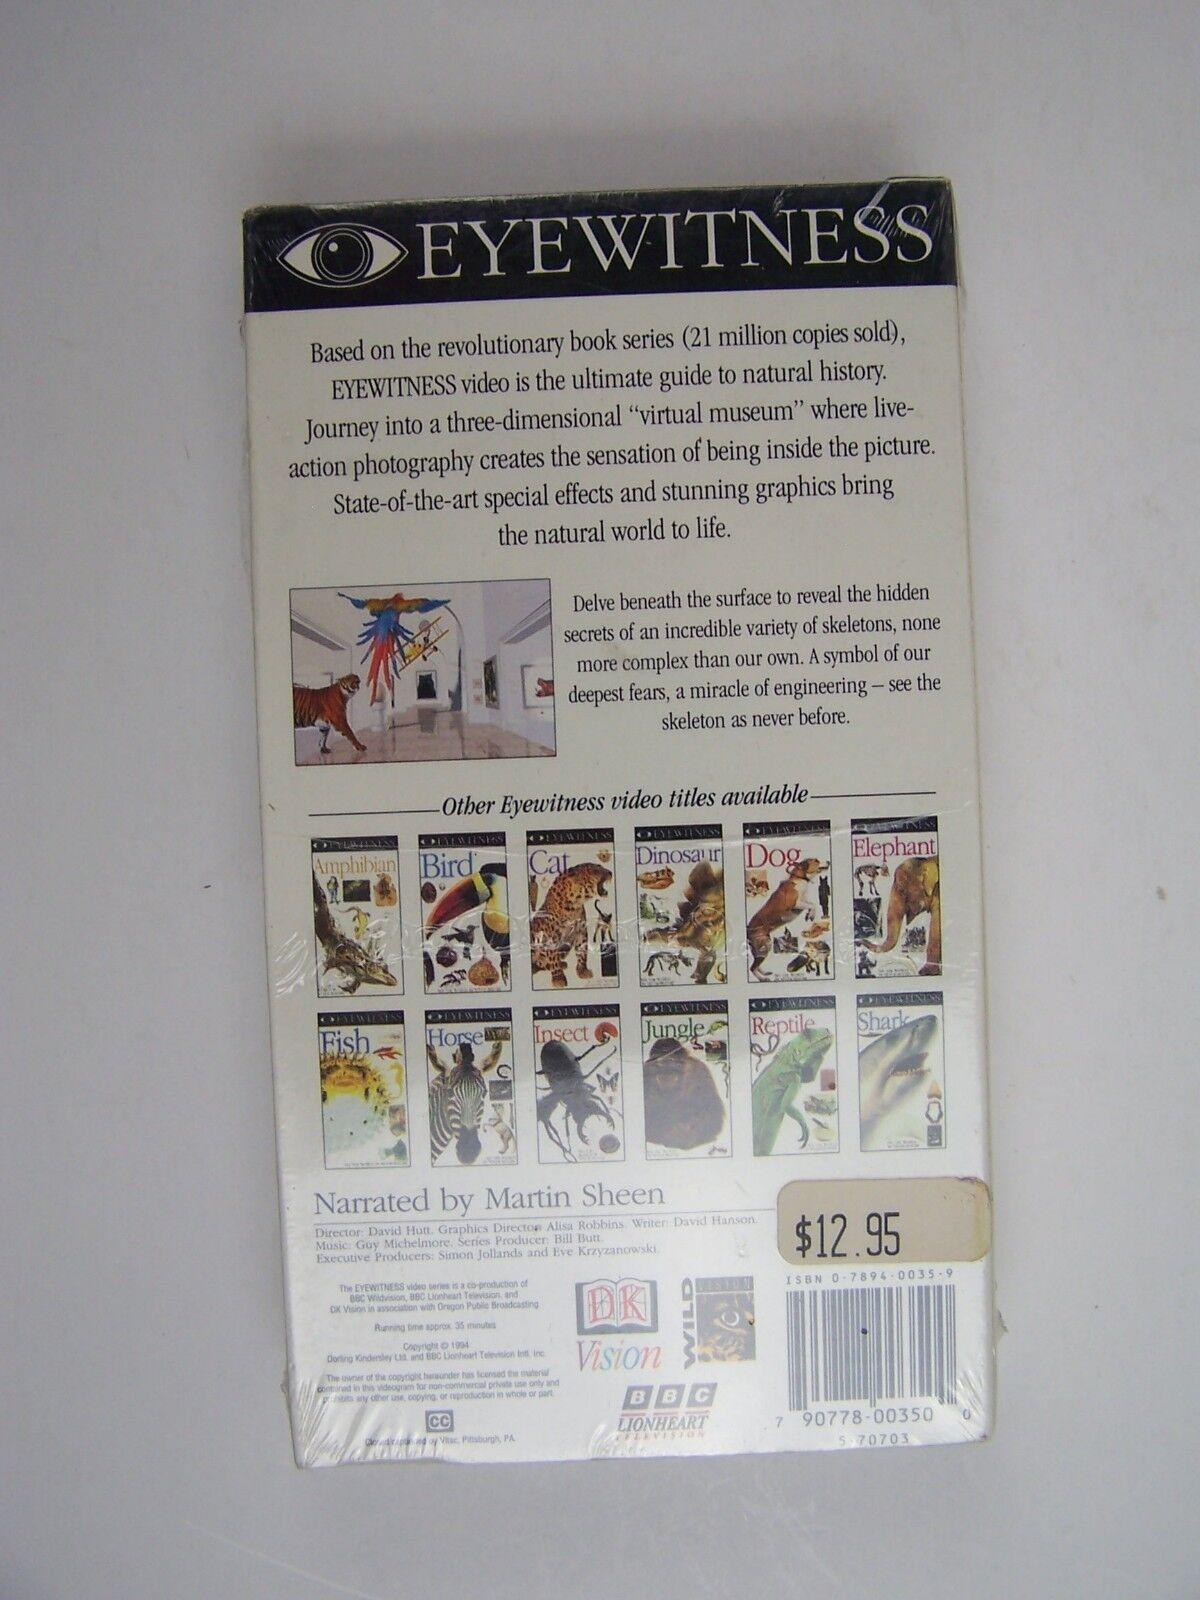 D.K. Eyewitness - Skeleton VHS Video Tape New Sealed